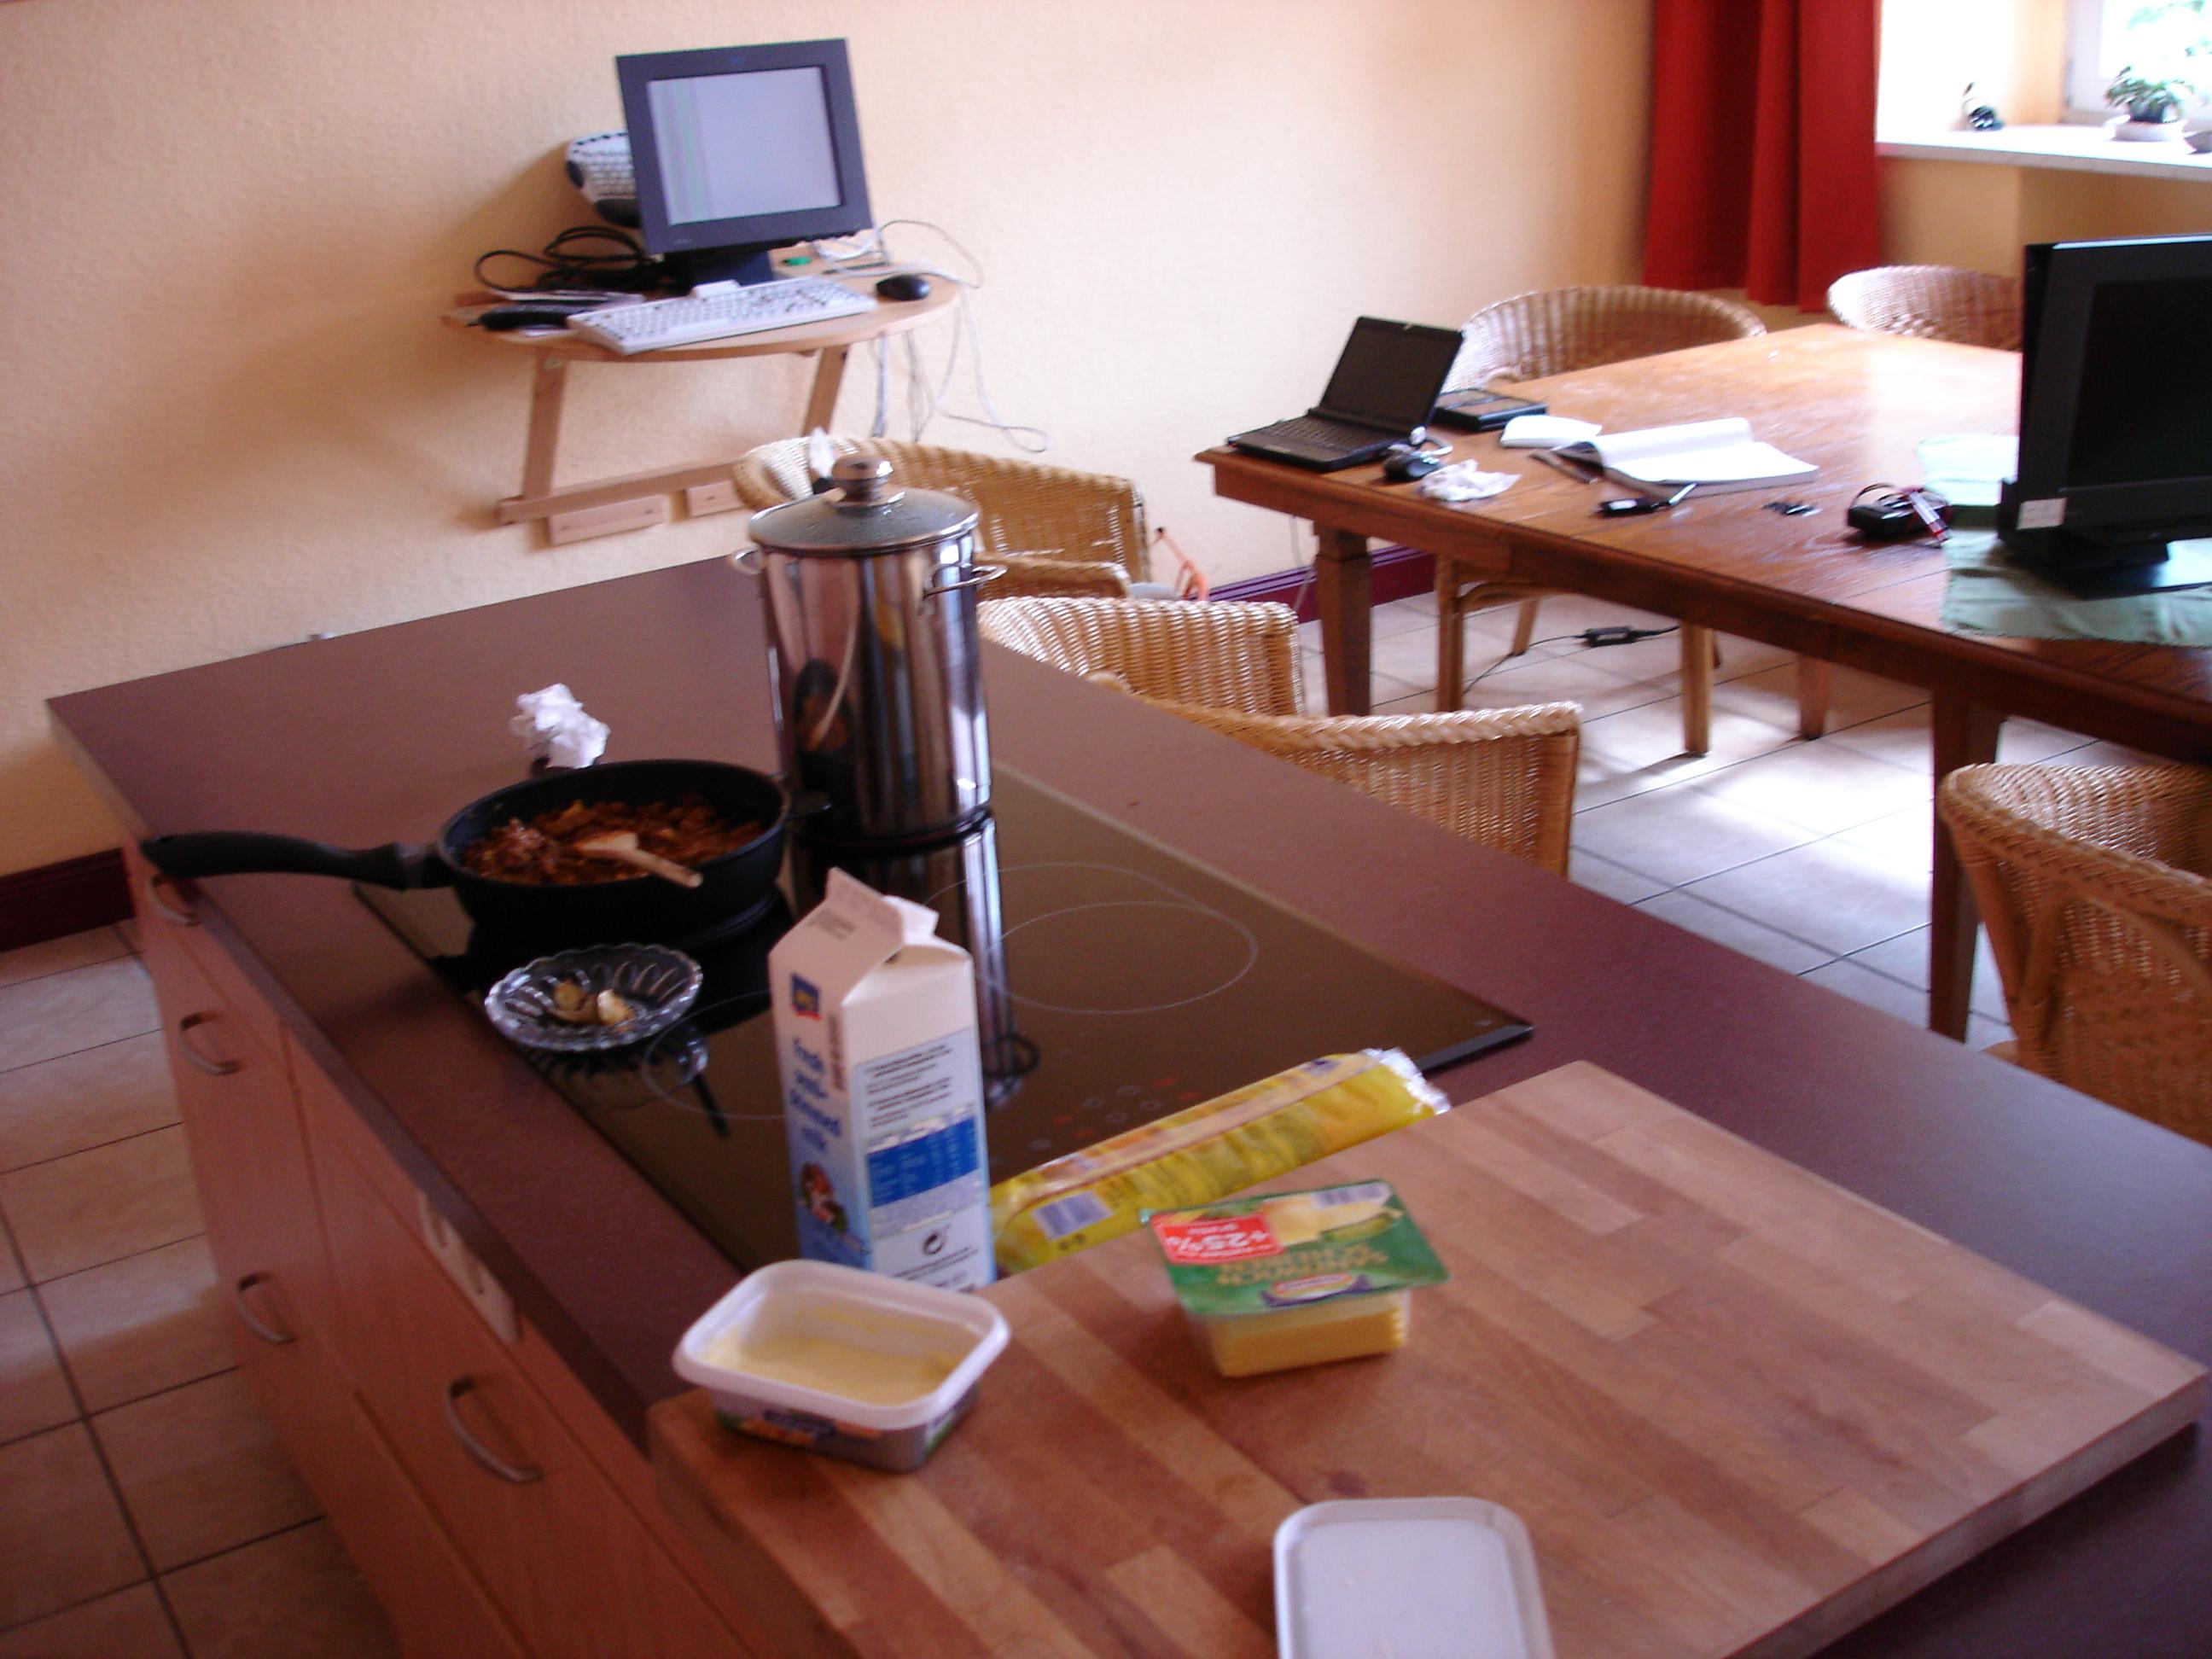 https://foodloader.net/Dany303_2009-04-30_Spaghetti_mit_Rinderhack_vorbereitung.jpg